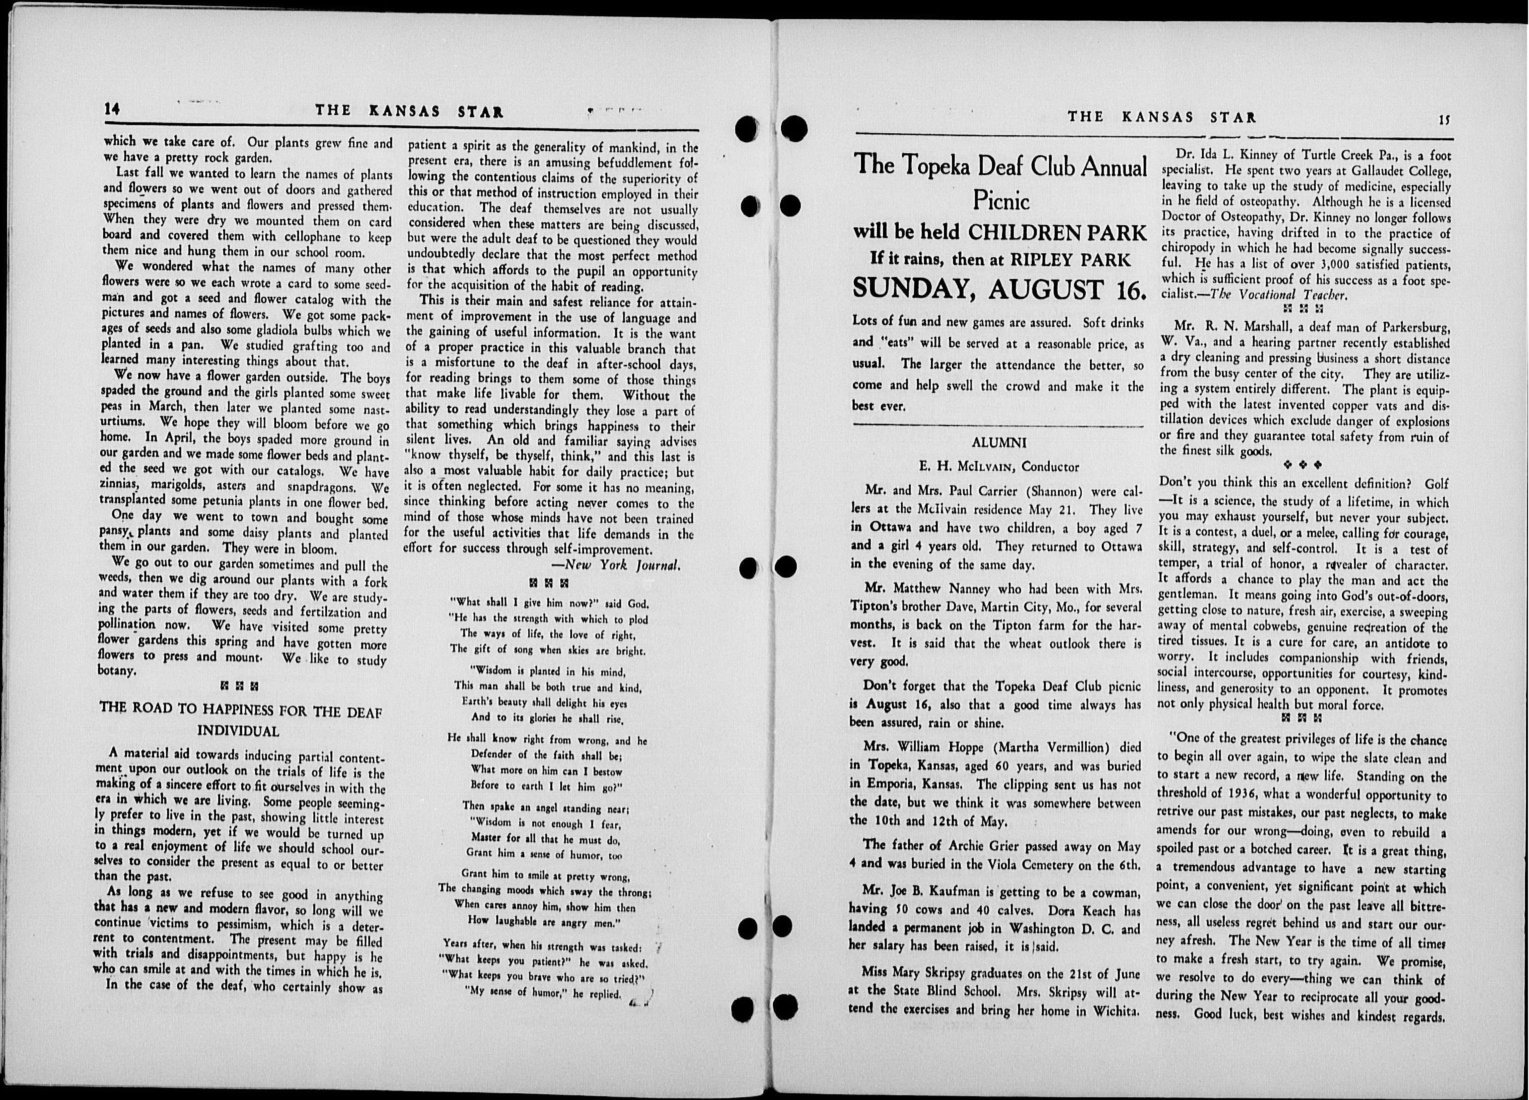 The Kansas Star, volume 50, number 8 - 14-15